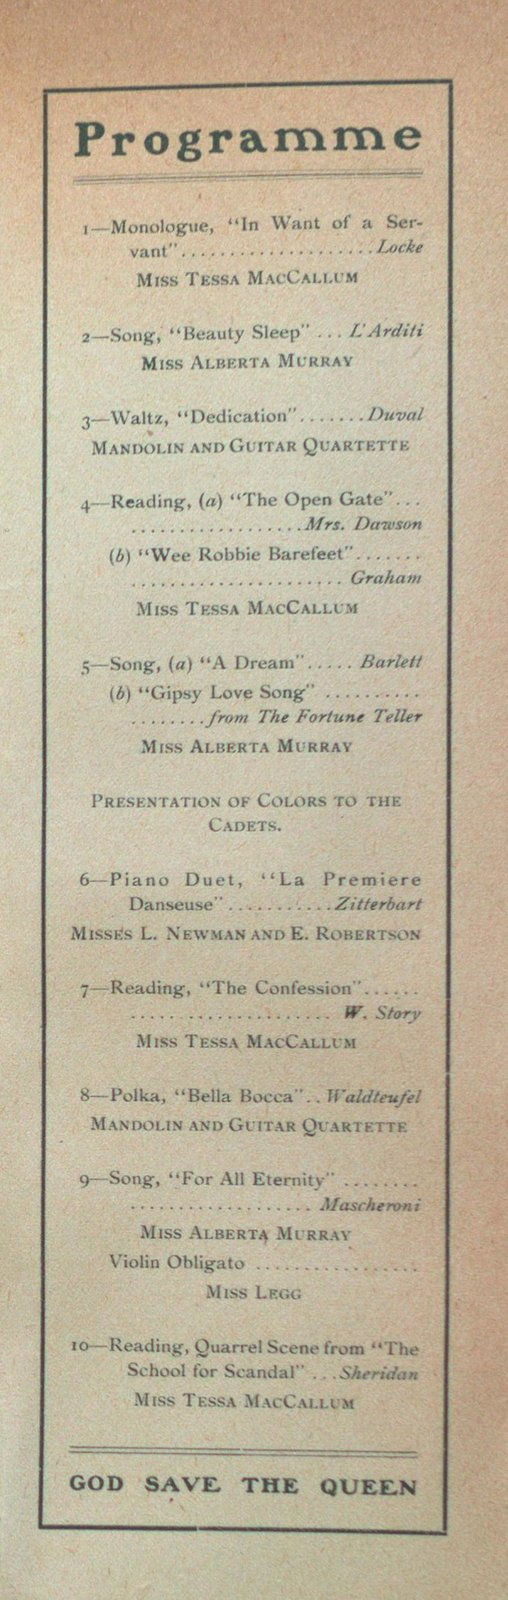 Teresa Vanderburgh's Musical Scrapbook #2 - St. Catharines Collegiate Institute Cadets